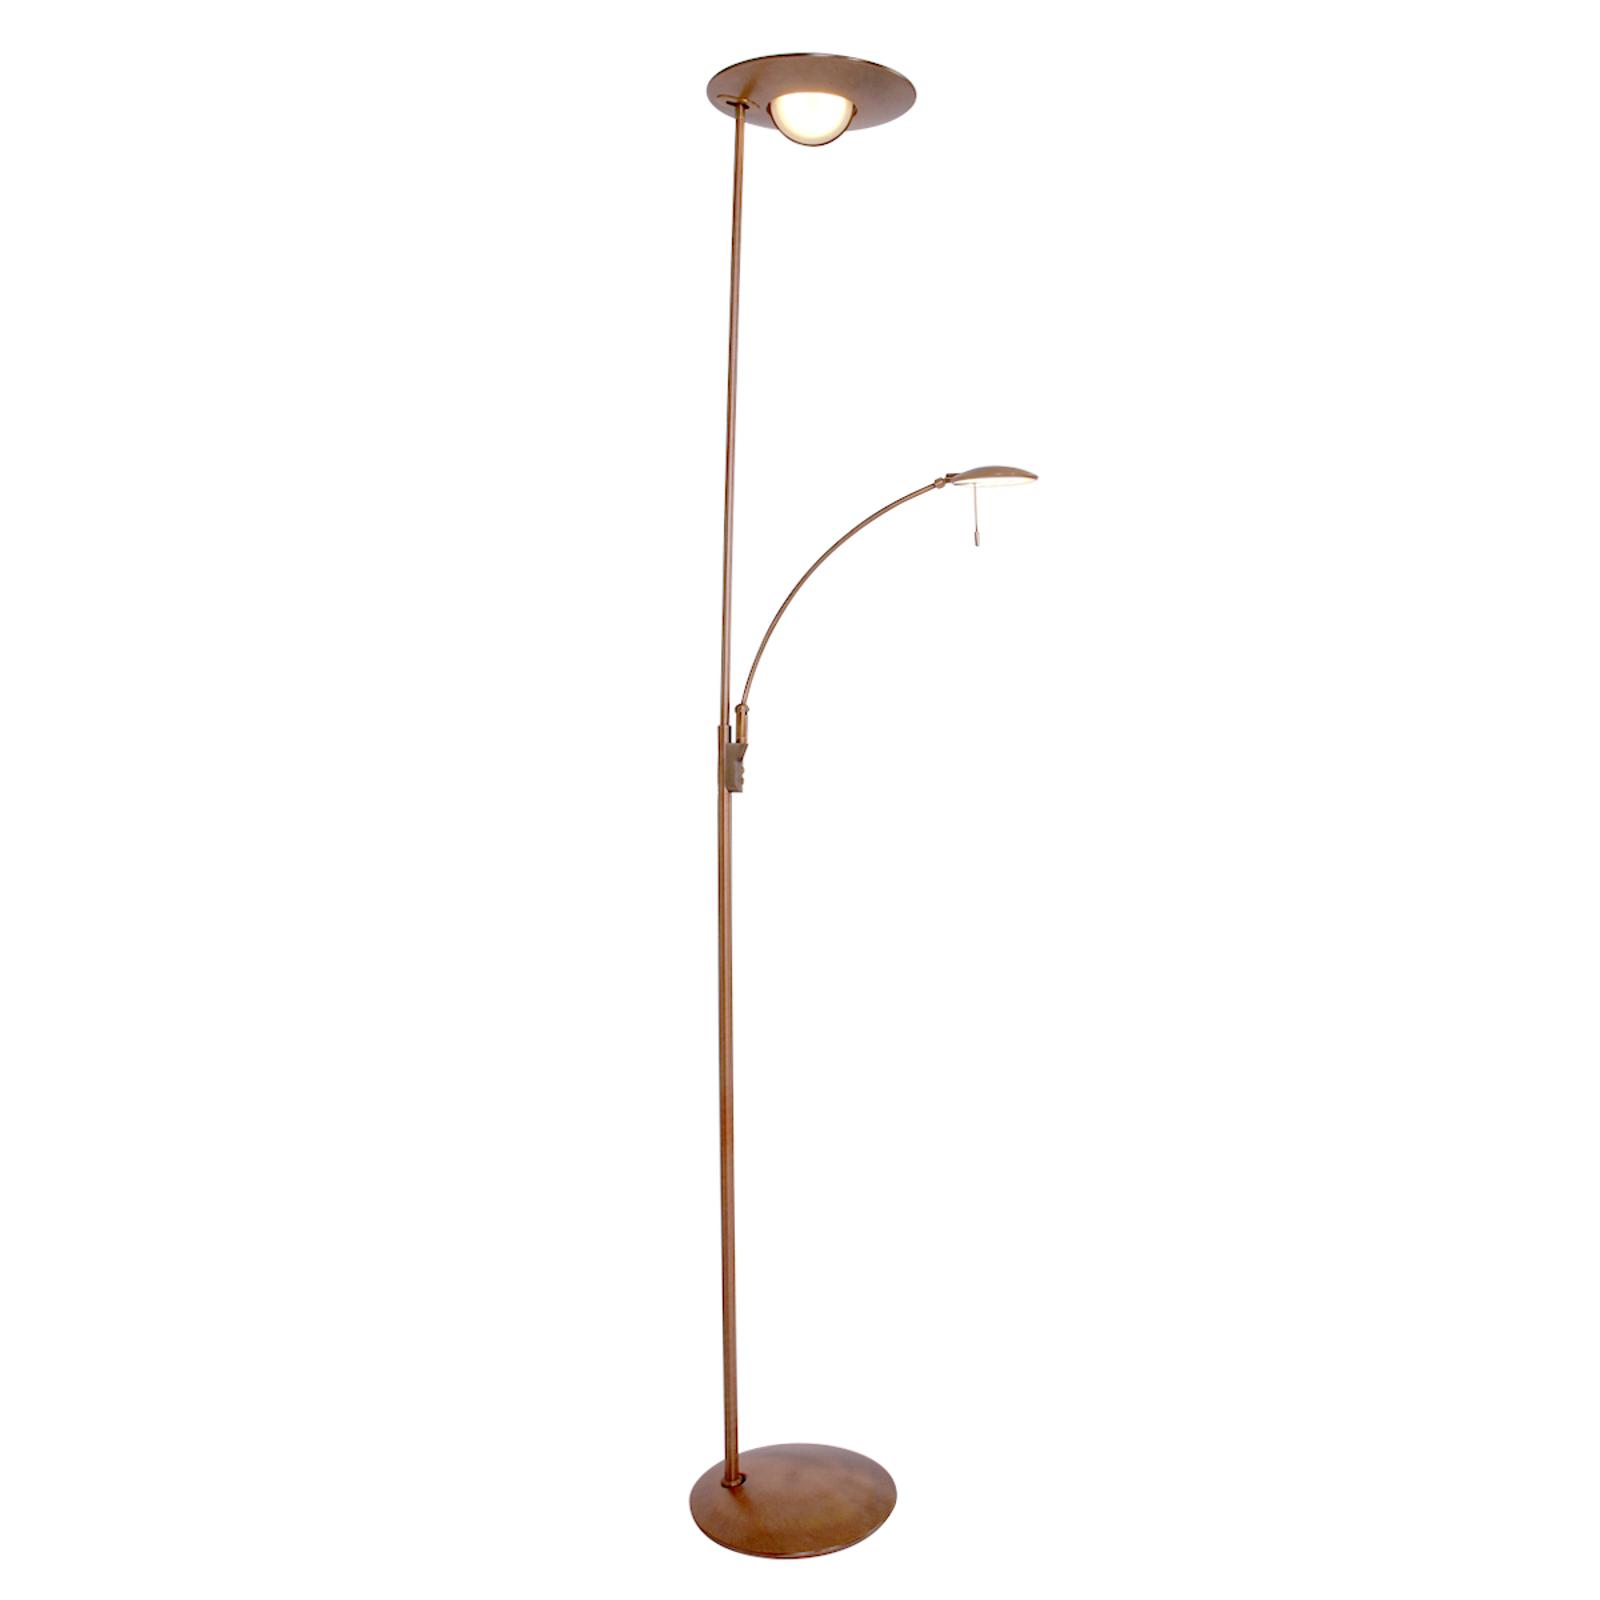 Bronzefarbene LED-Stehlampe Zenith, Dimmer